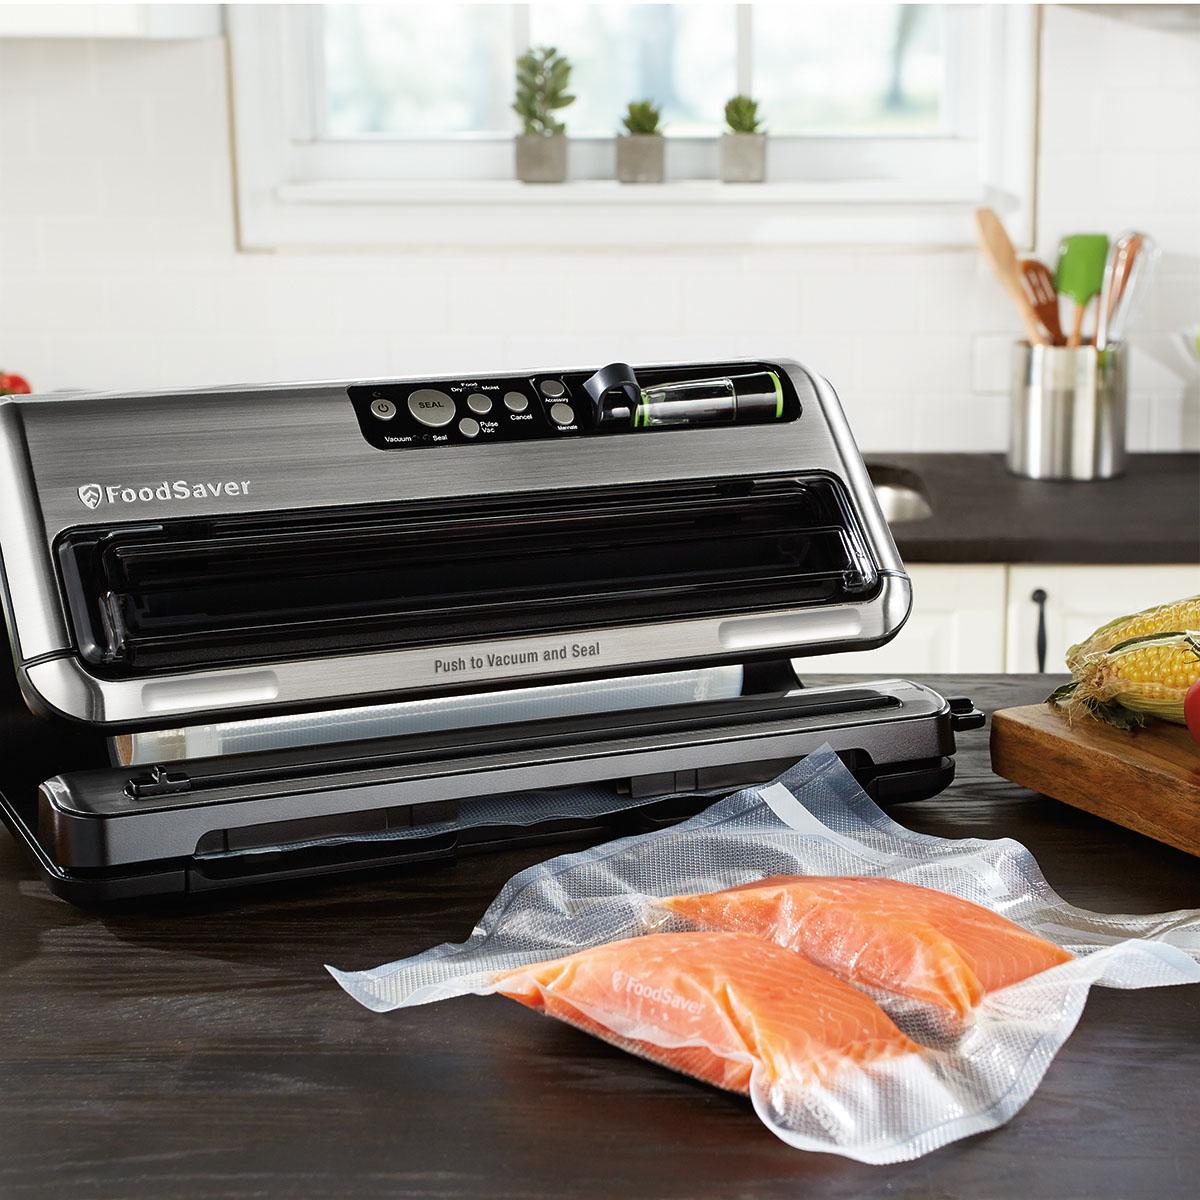 The FoodSaver FM5460 2-in-1 Food Preservation System FM5460-DTC 4